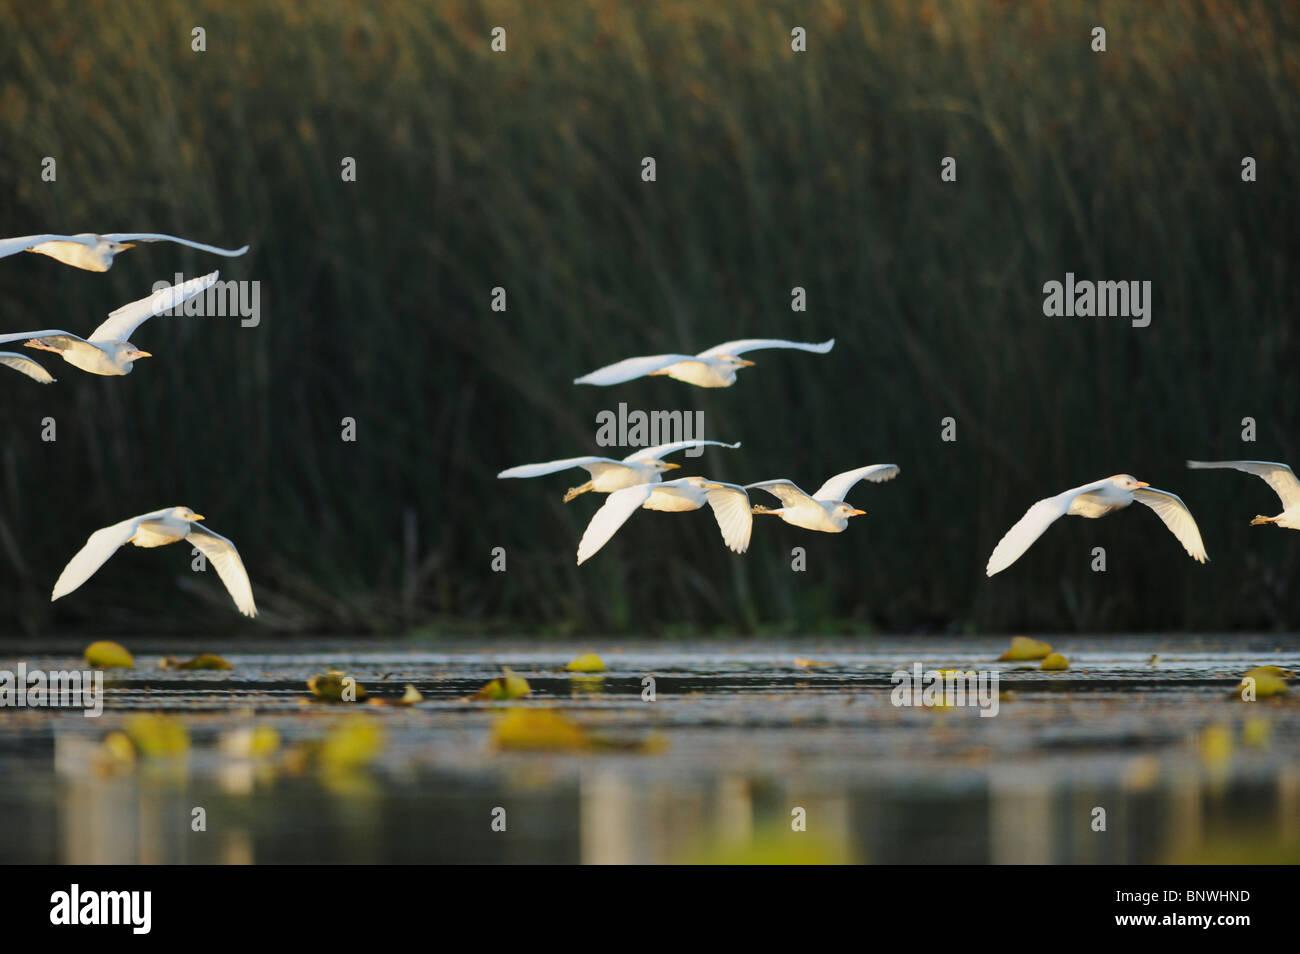 Cattle Egret (Bubulcus ibis), flock in flight, Fennessey Ranch, Refugio, Coastal Bend, Texas Coast, USA - Stock Image